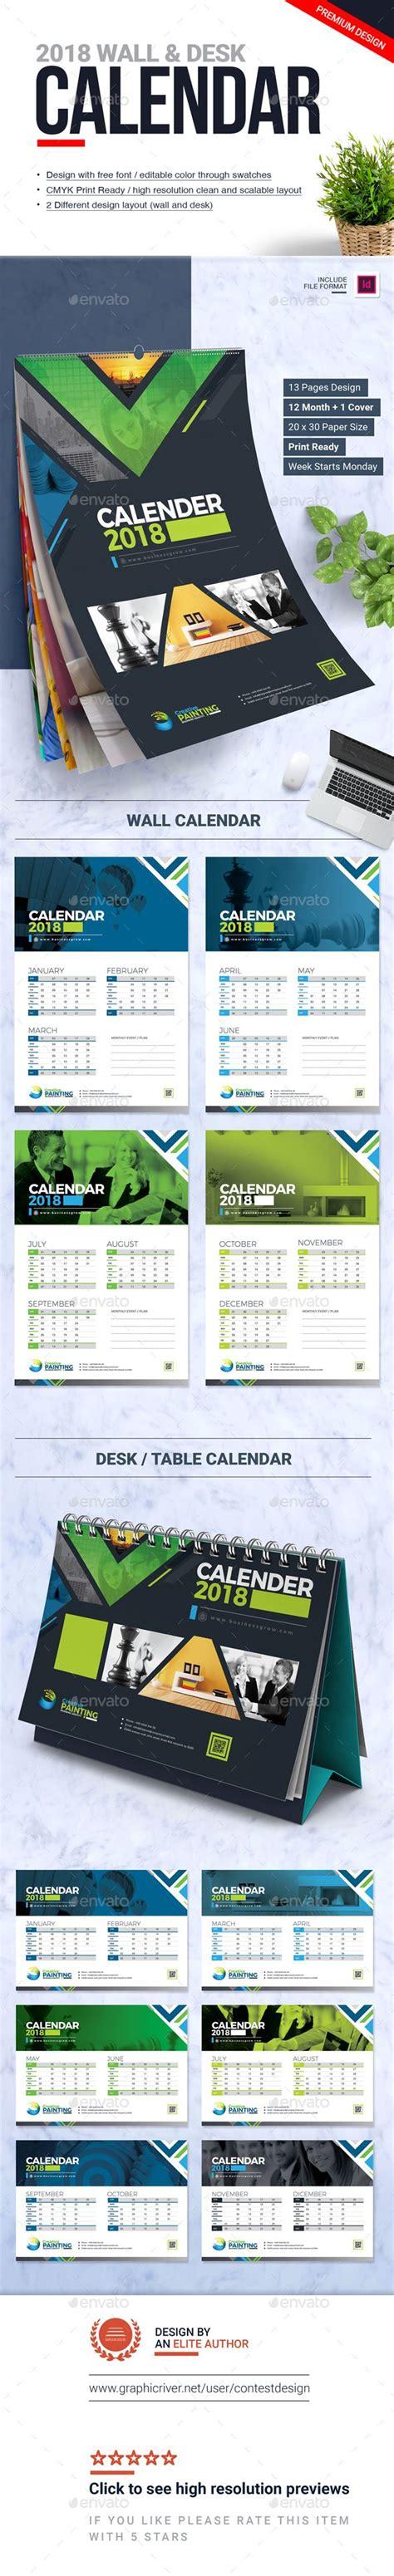 calendar design template indesign indd wall